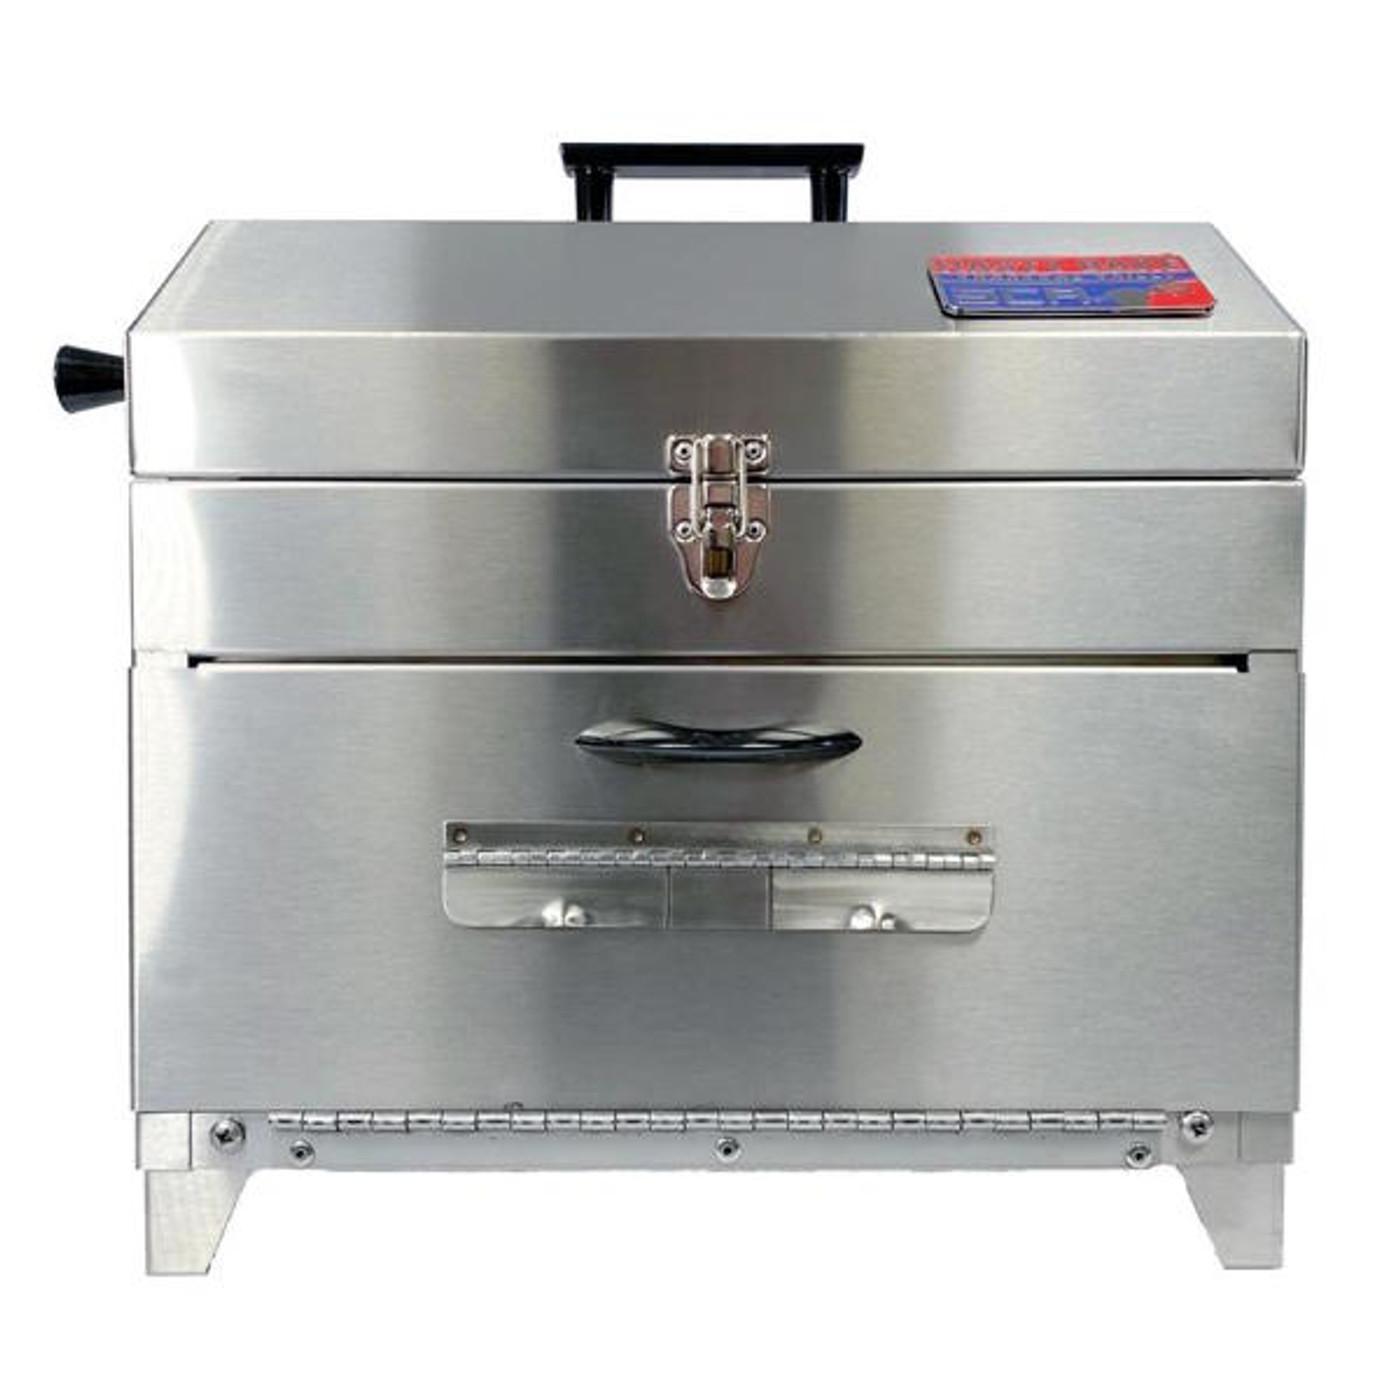 Hasty Bake - HB 250 Pro